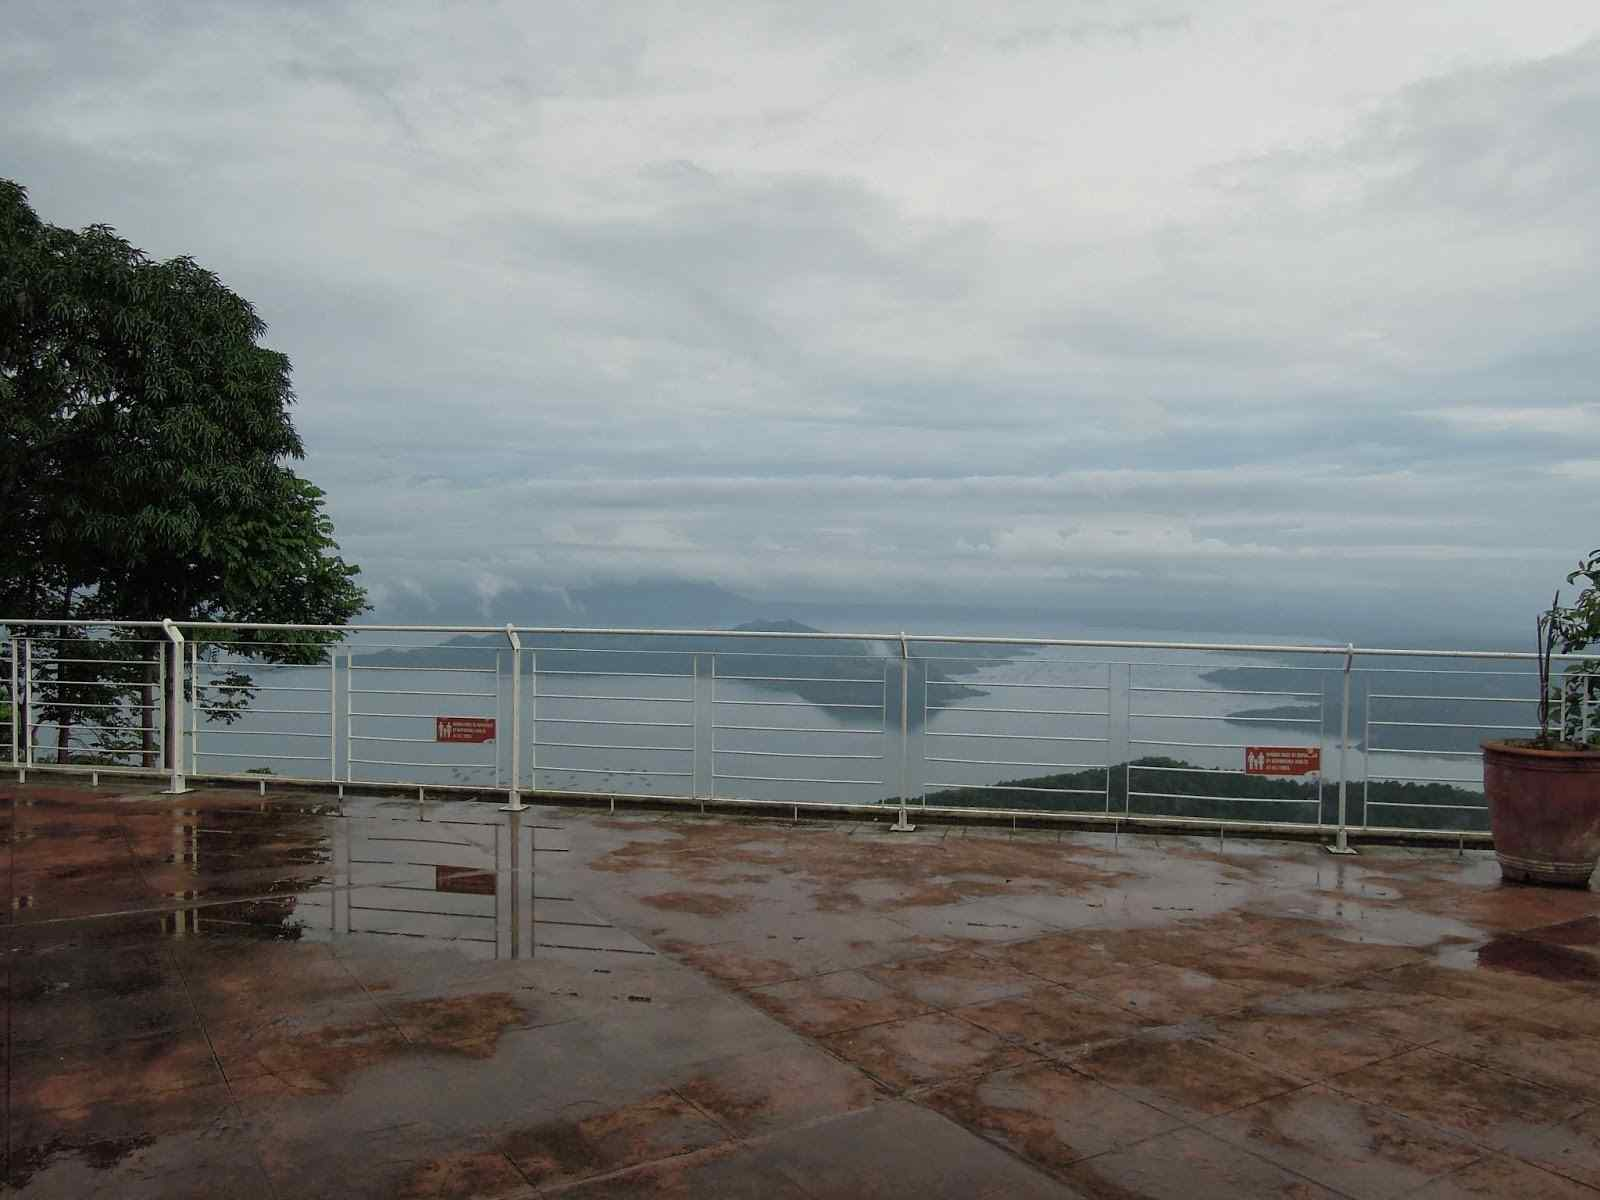 Traveling to Tagaytay and Taal Lake post COVID-19 lockdown